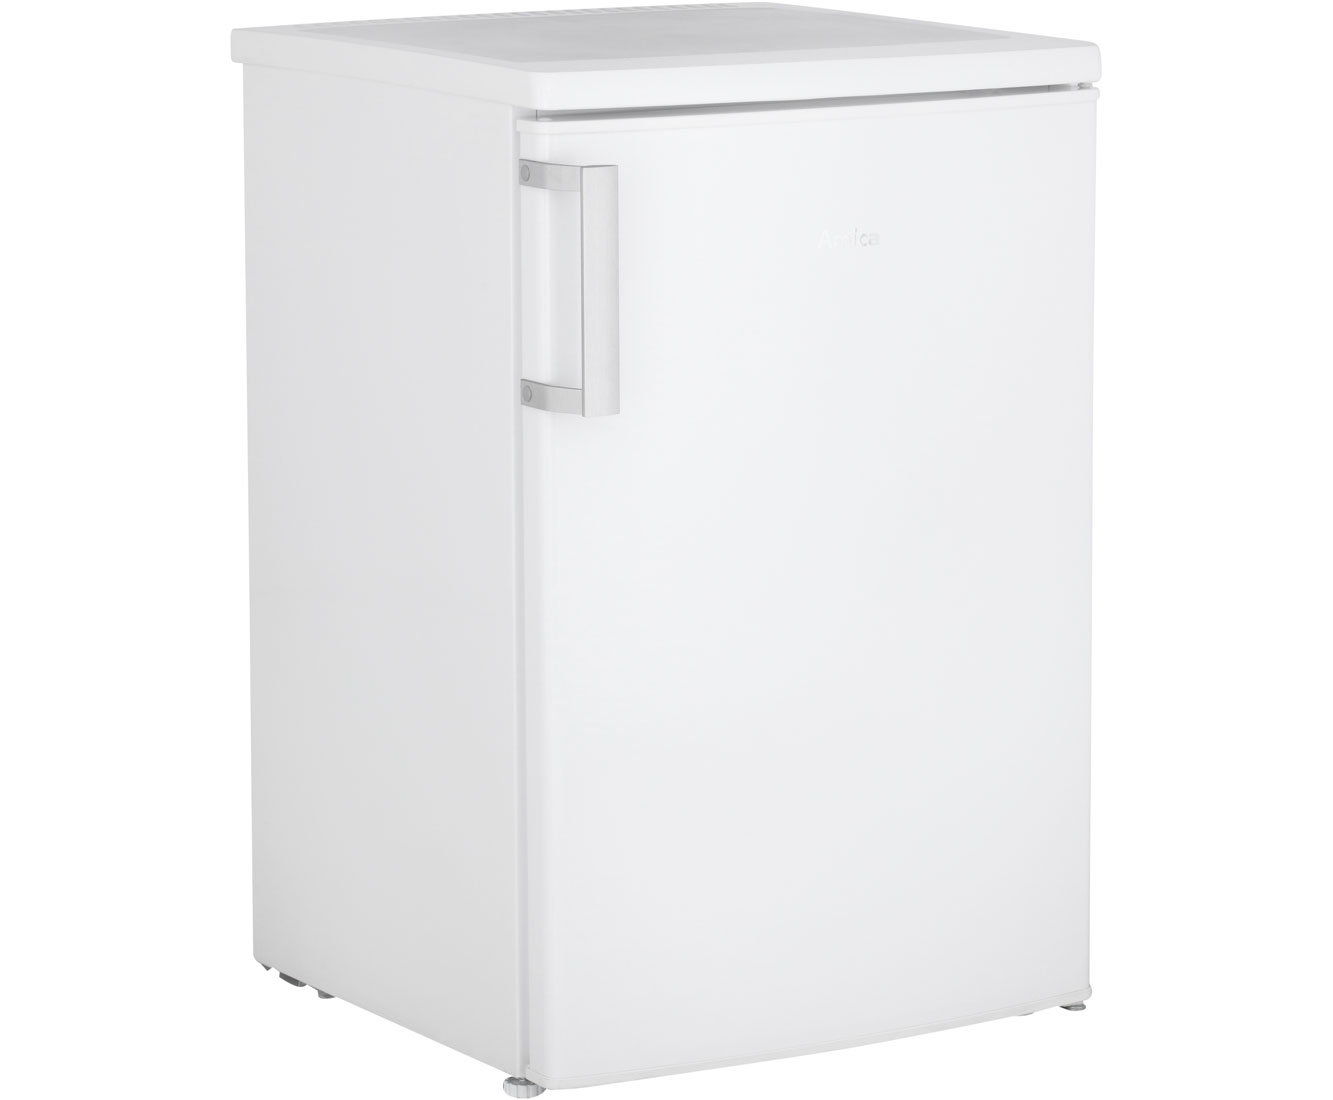 Amica Kühlschrank Firma : Amica ks w kühlschrank mit gefrierfach weiß a